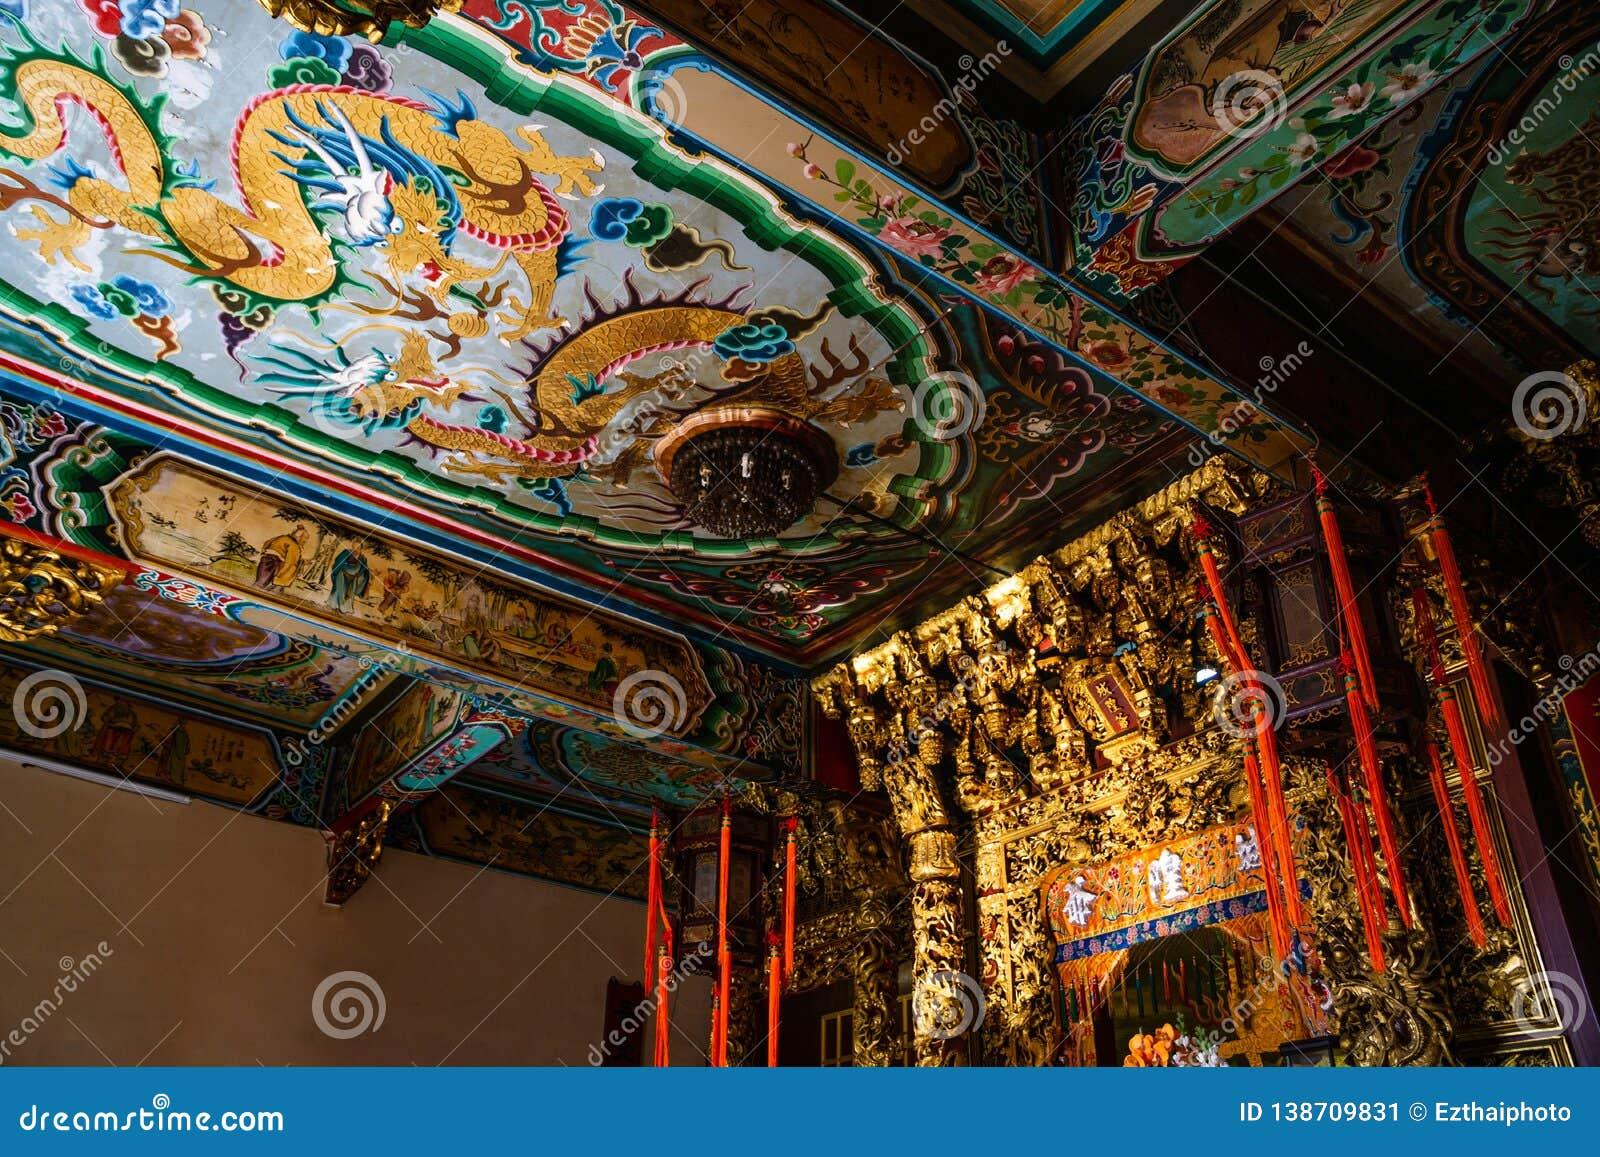 Samut Prakan, Ταϊλάνδης - 3 Φεβρουαρίου, 2019: Όμορφο ανώτατο όριο τέχνης tradintional κινεζικό στη λάρνακα Xian Dai Lo Tian Gong